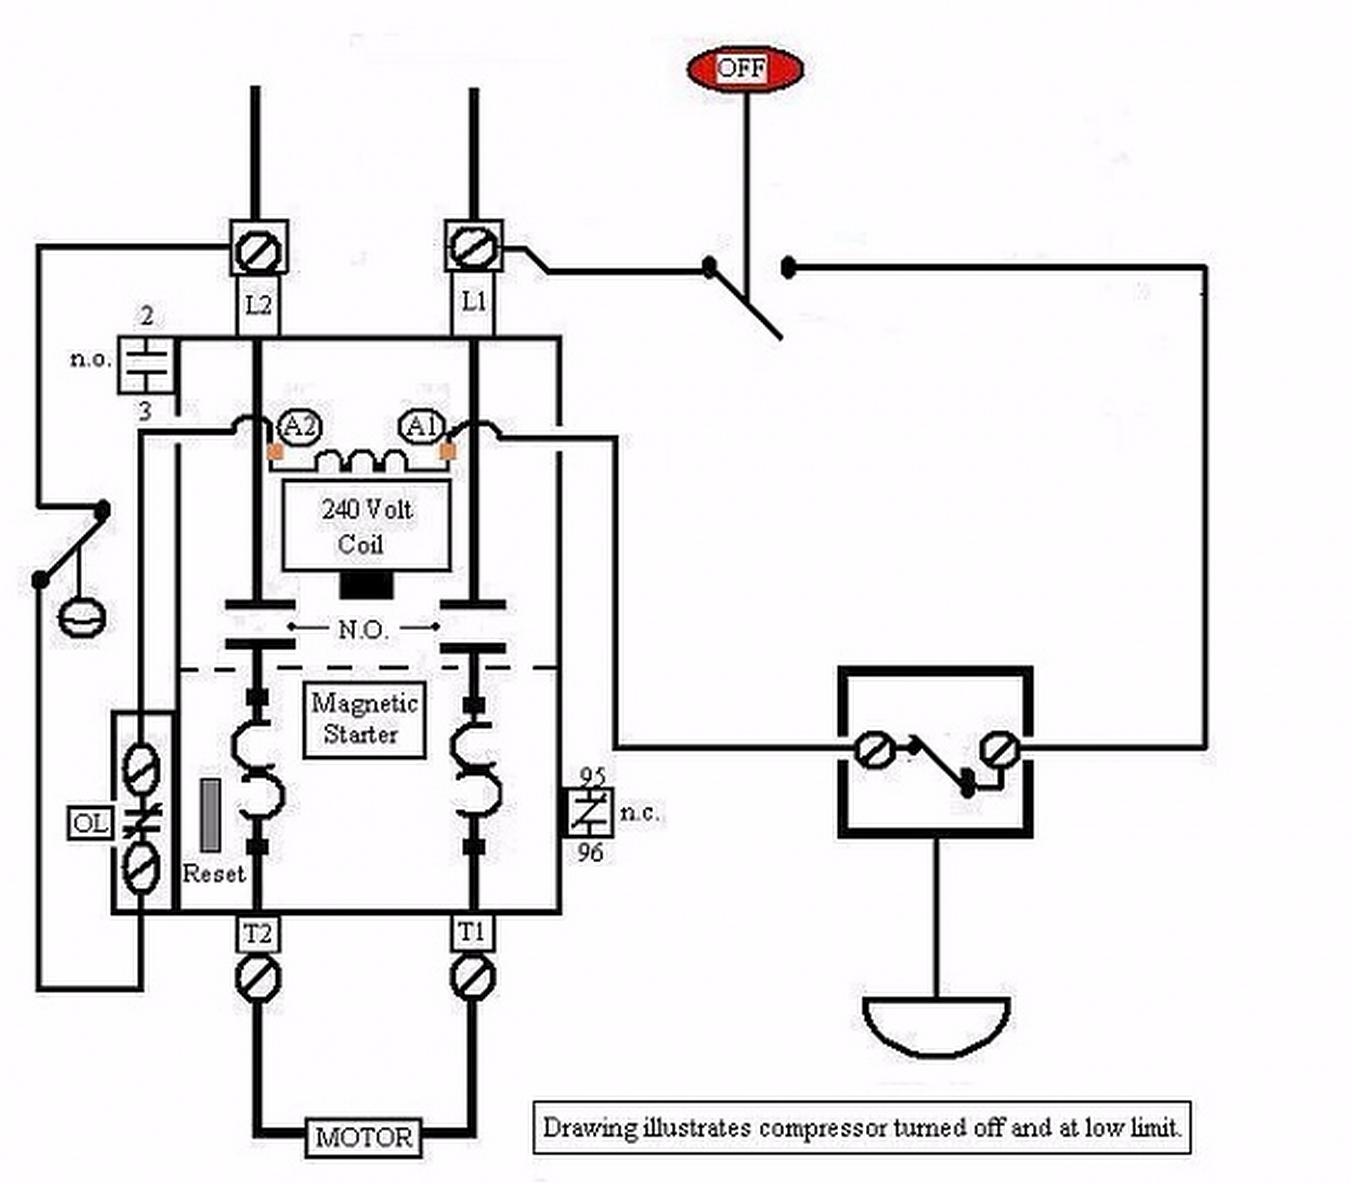 Air Pressor Wiring Diagram 240 Volt Air Pressor Motor Wiring Diagram